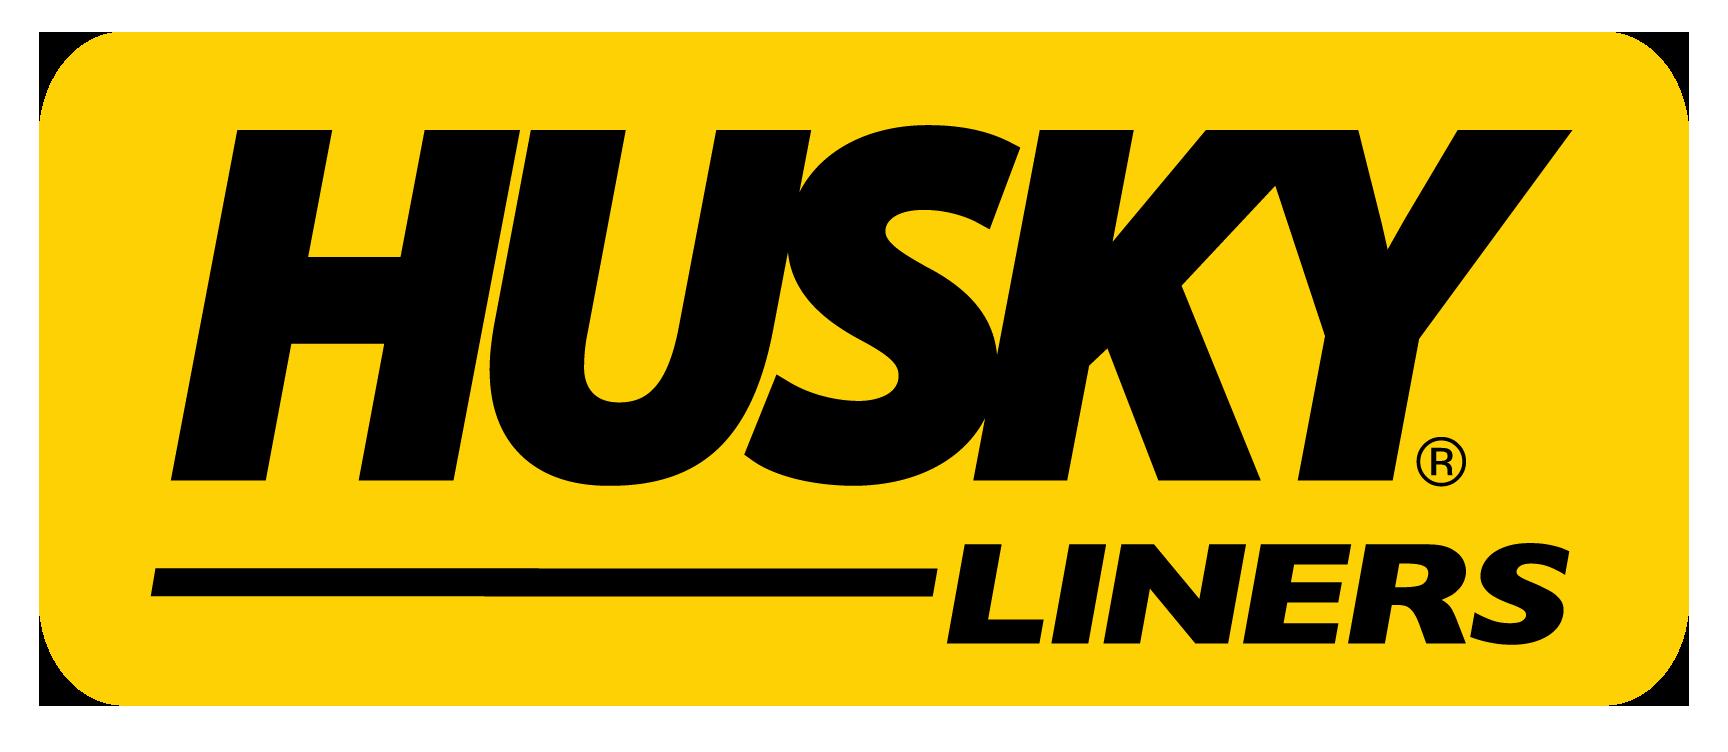 Husky Liners - Logo